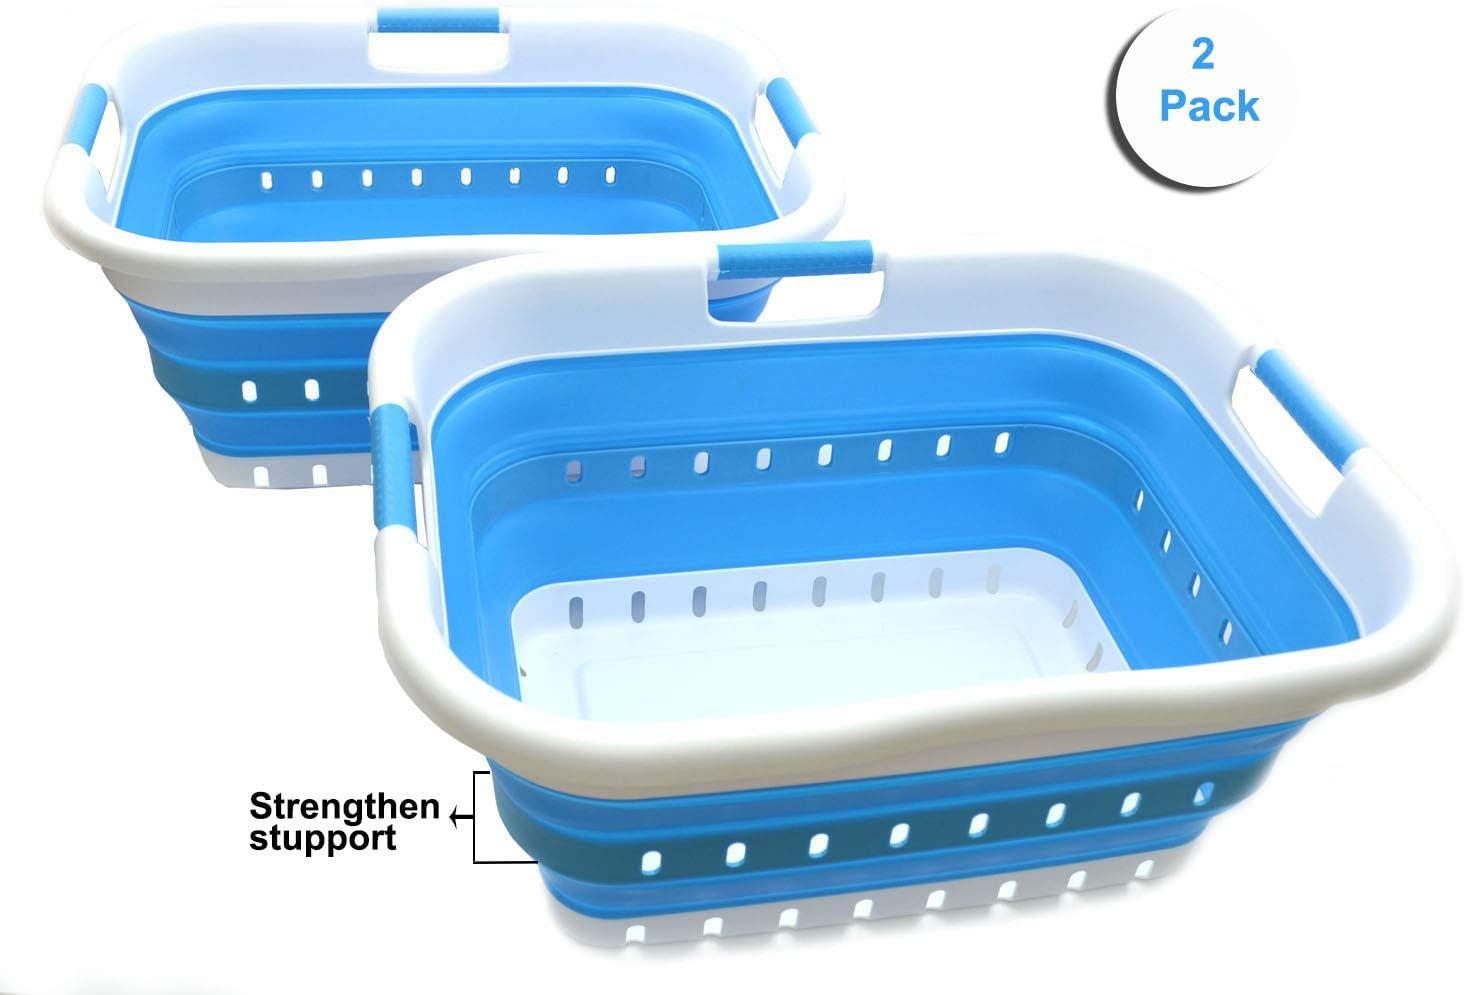 SAMMART Set of 2 Collapsible 3 Handled Plastic Laundry Basket - Foldable Pop Up Storage Container/Organizer - Portable Washing Tub - Space Saving Hamper/Basket (2, White/Sky Blue)